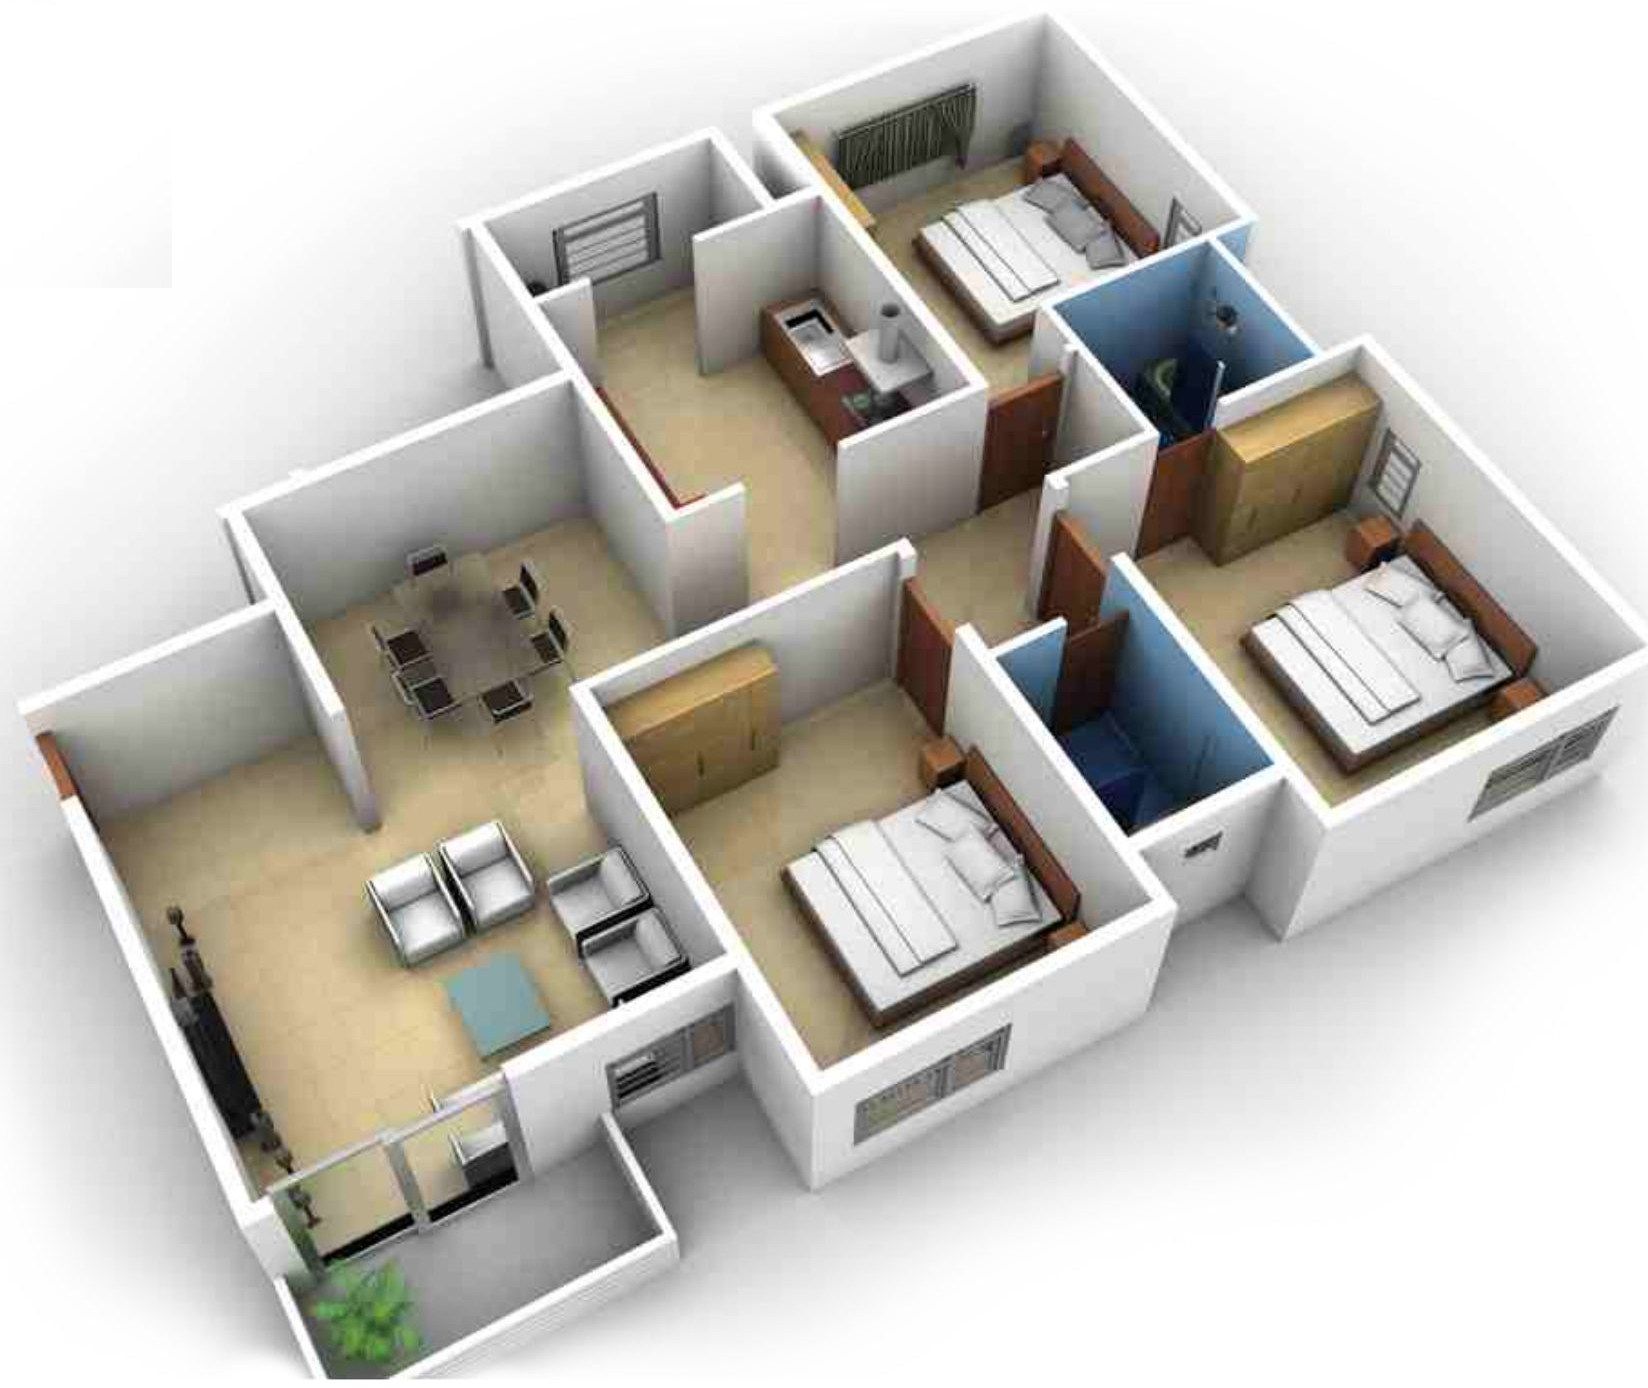 Home Design 3d Free Reviews: Bluejay Aston In Rajaji Nagar, Bangalore